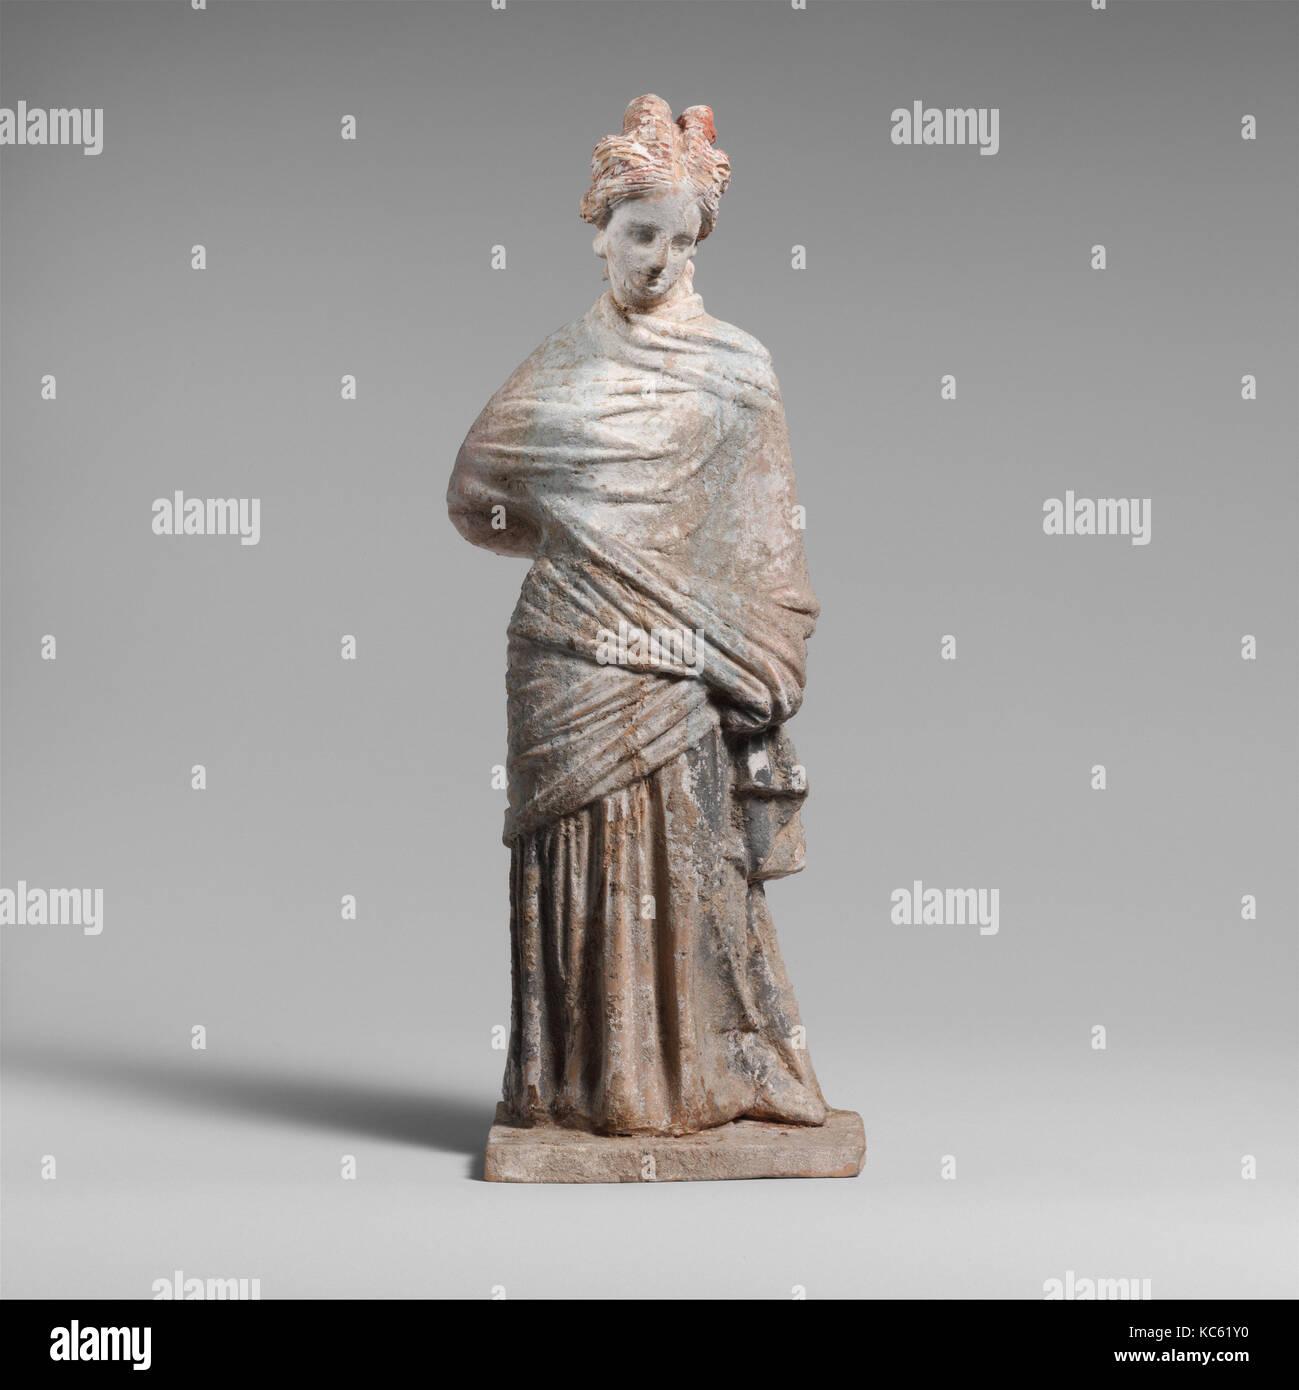 Terracotta draped woman, Hellenistic, 3rd century B.C., Greek, Boeotian, Terracotta, H. 7 3/4in. (19.6 cm), Terracottas - Stock Image